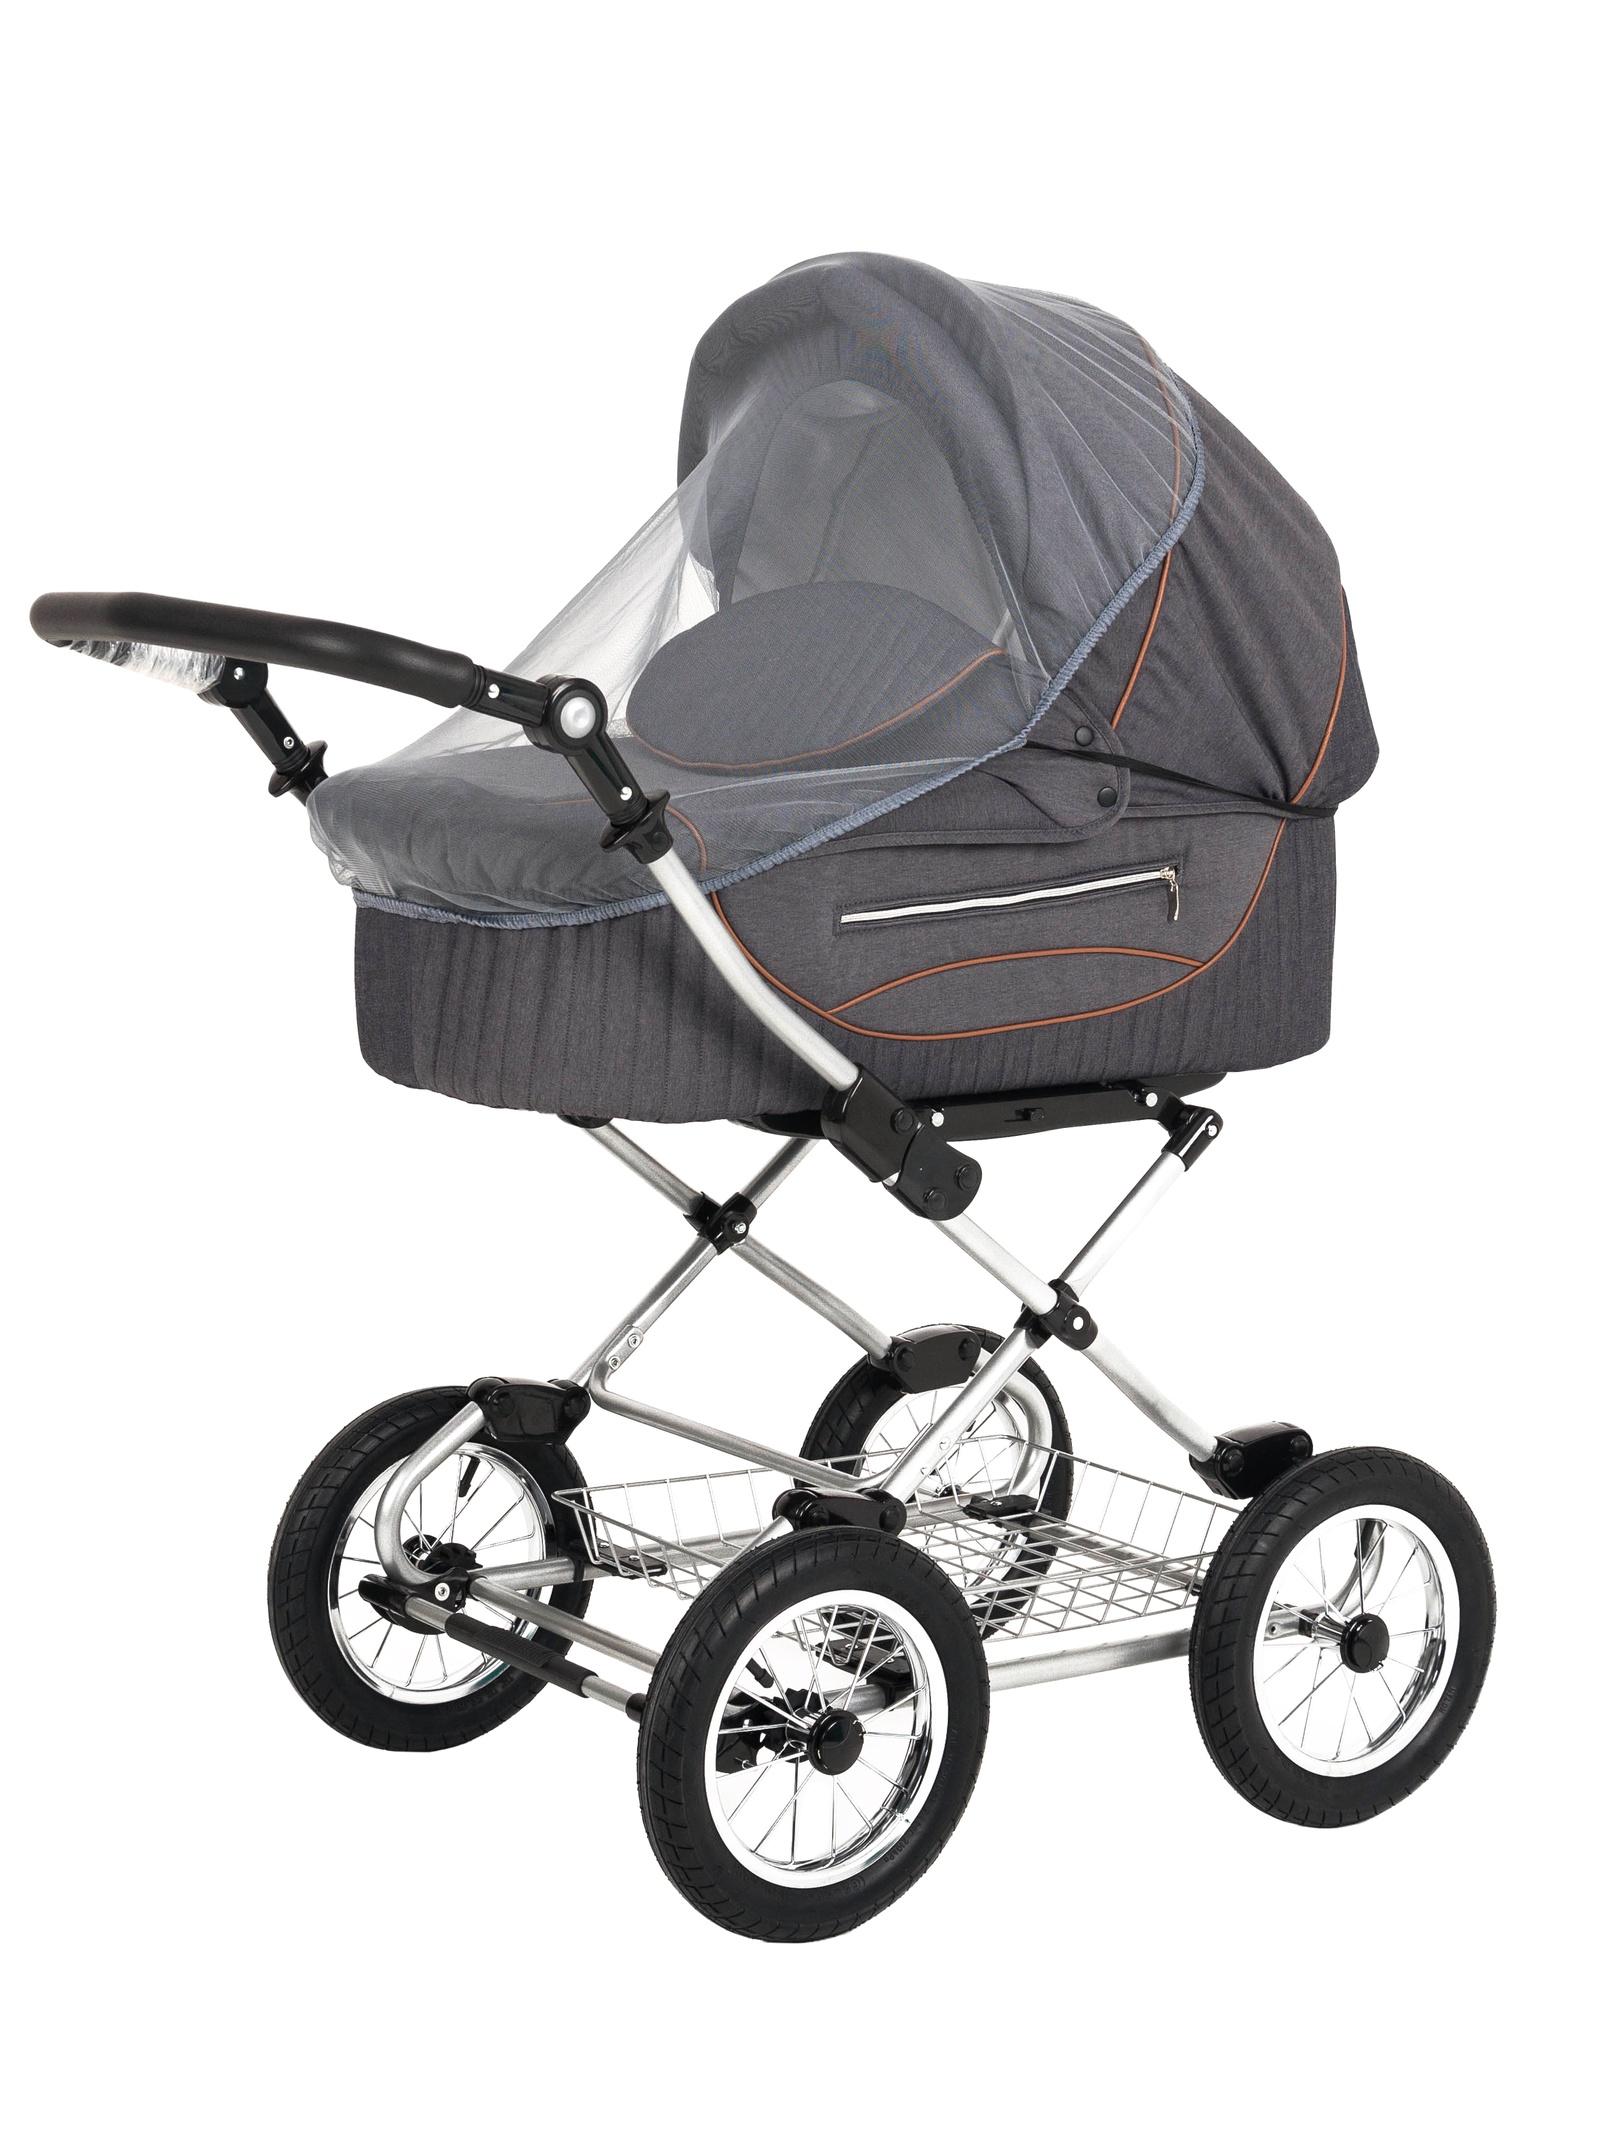 Аксессуар для колясок Trottola Москитная сетка на коляску люльку SUMMER NET CLASSIC серый москитная сетка baby care classic plus белая